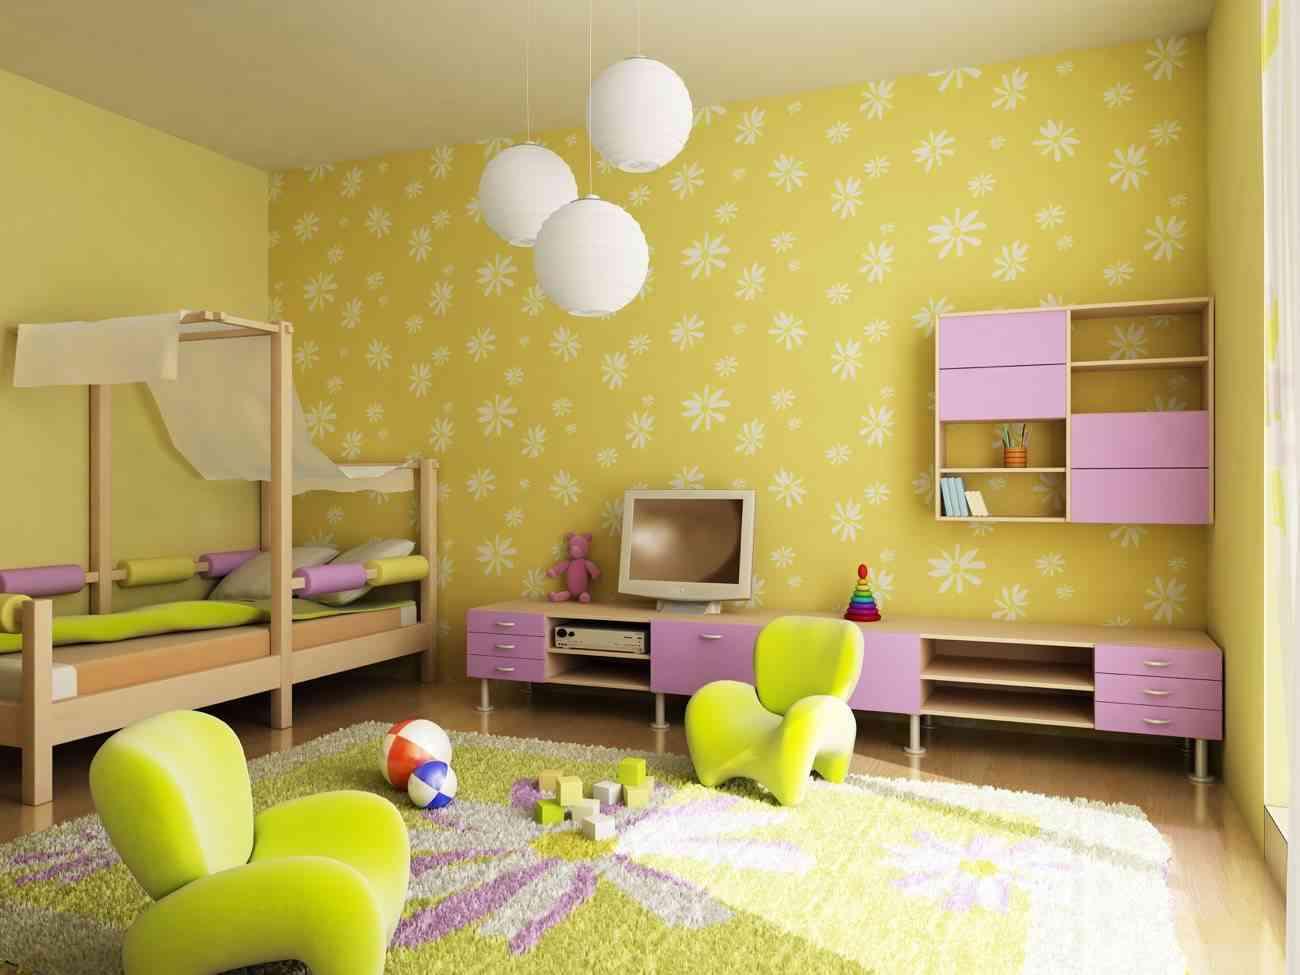 Muebles para piso peque o muy econ micos for Armarios pequenos baratos